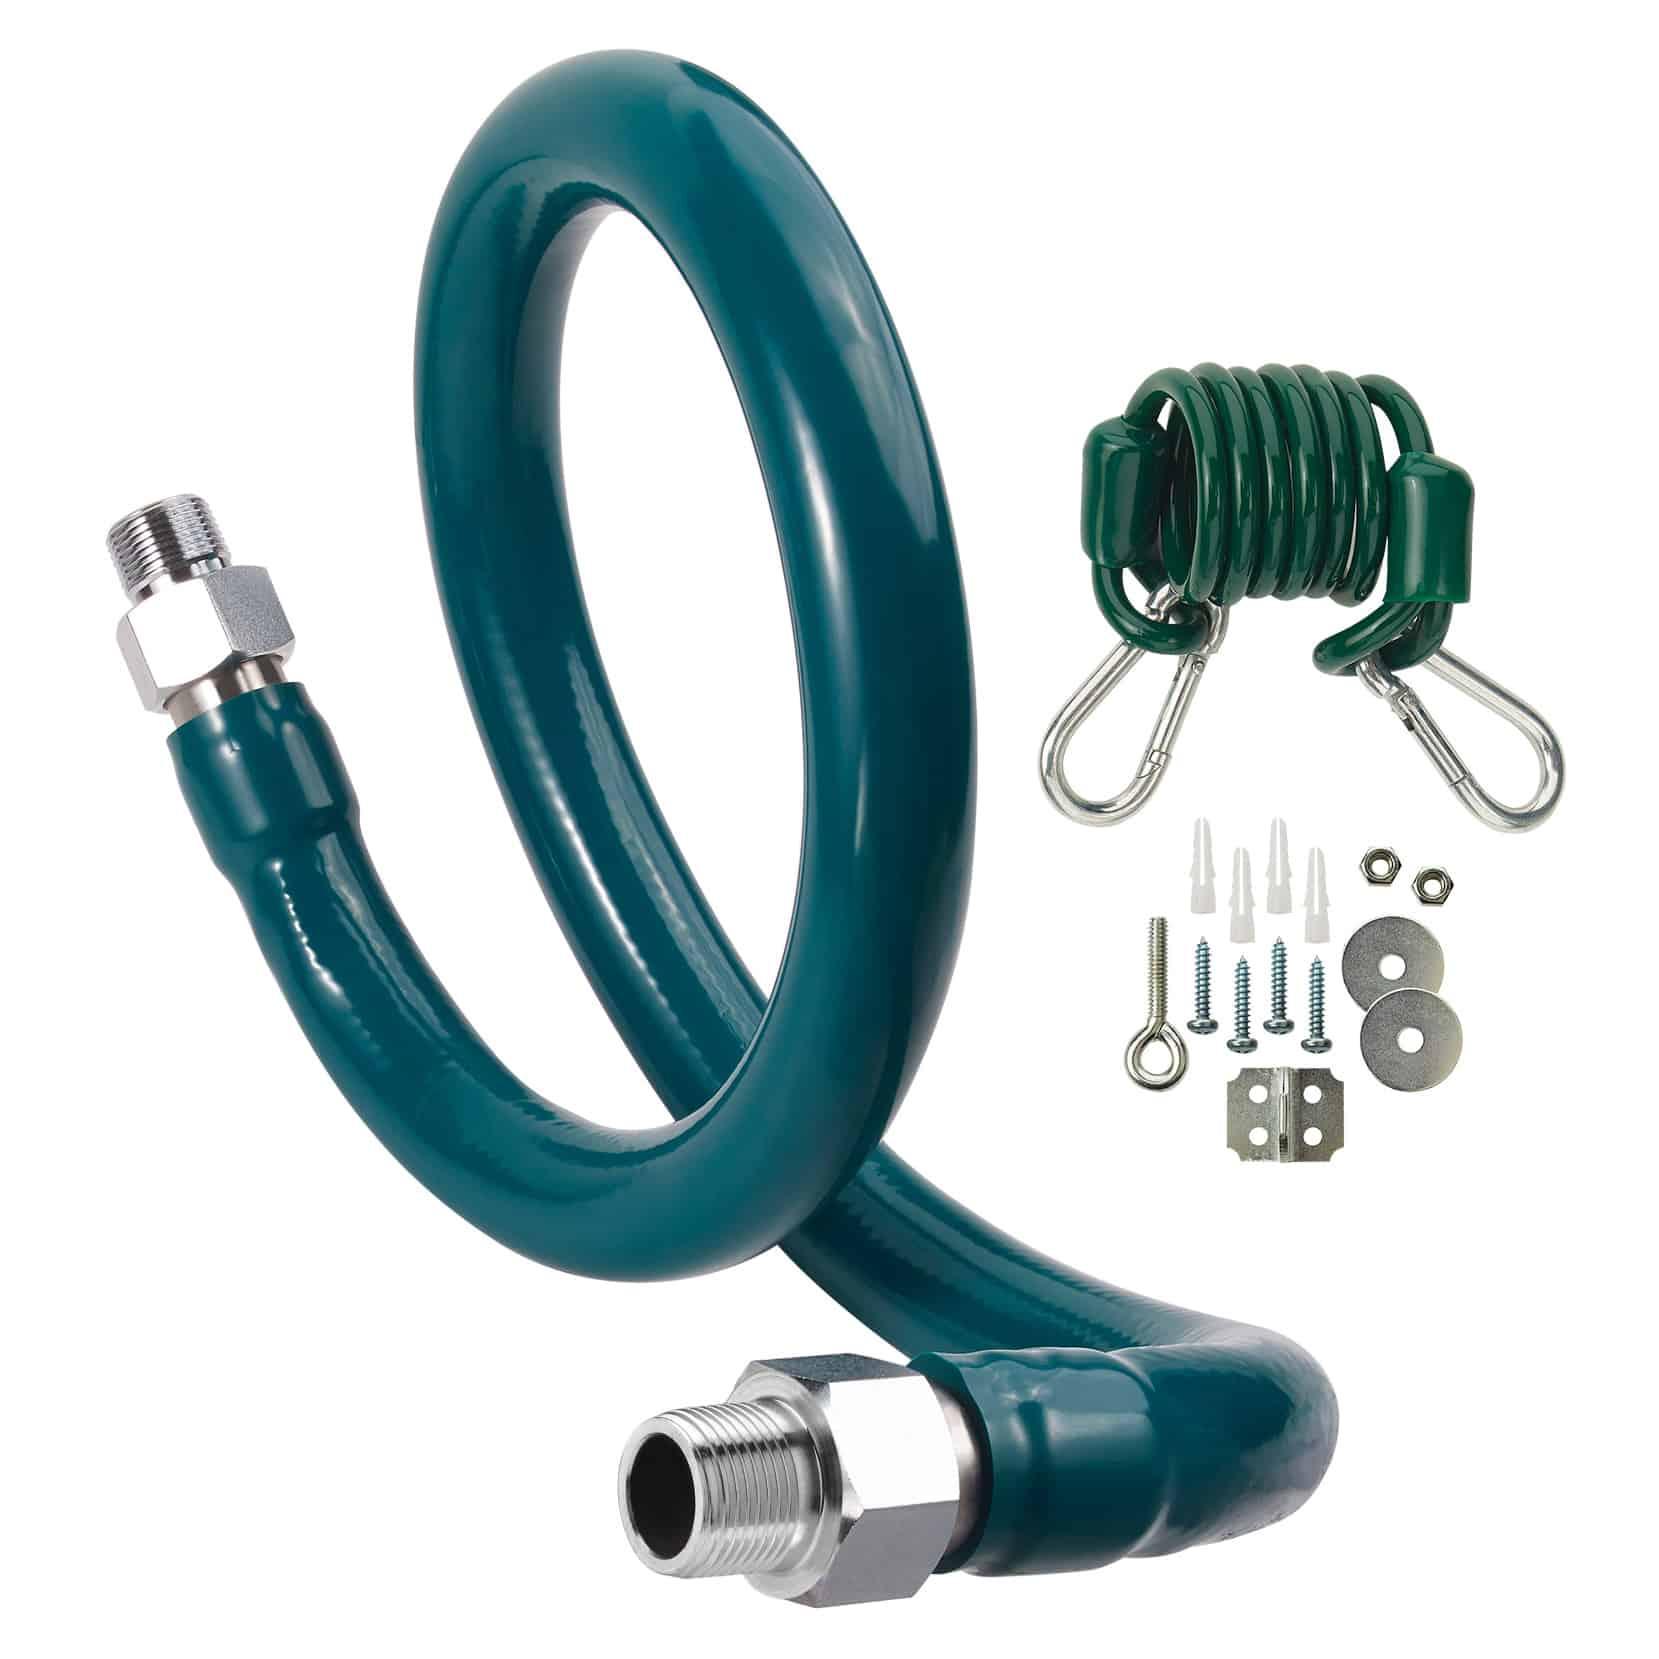 krowne-m7560k6-royal-series-moveable-gas-connection-kit.jpg